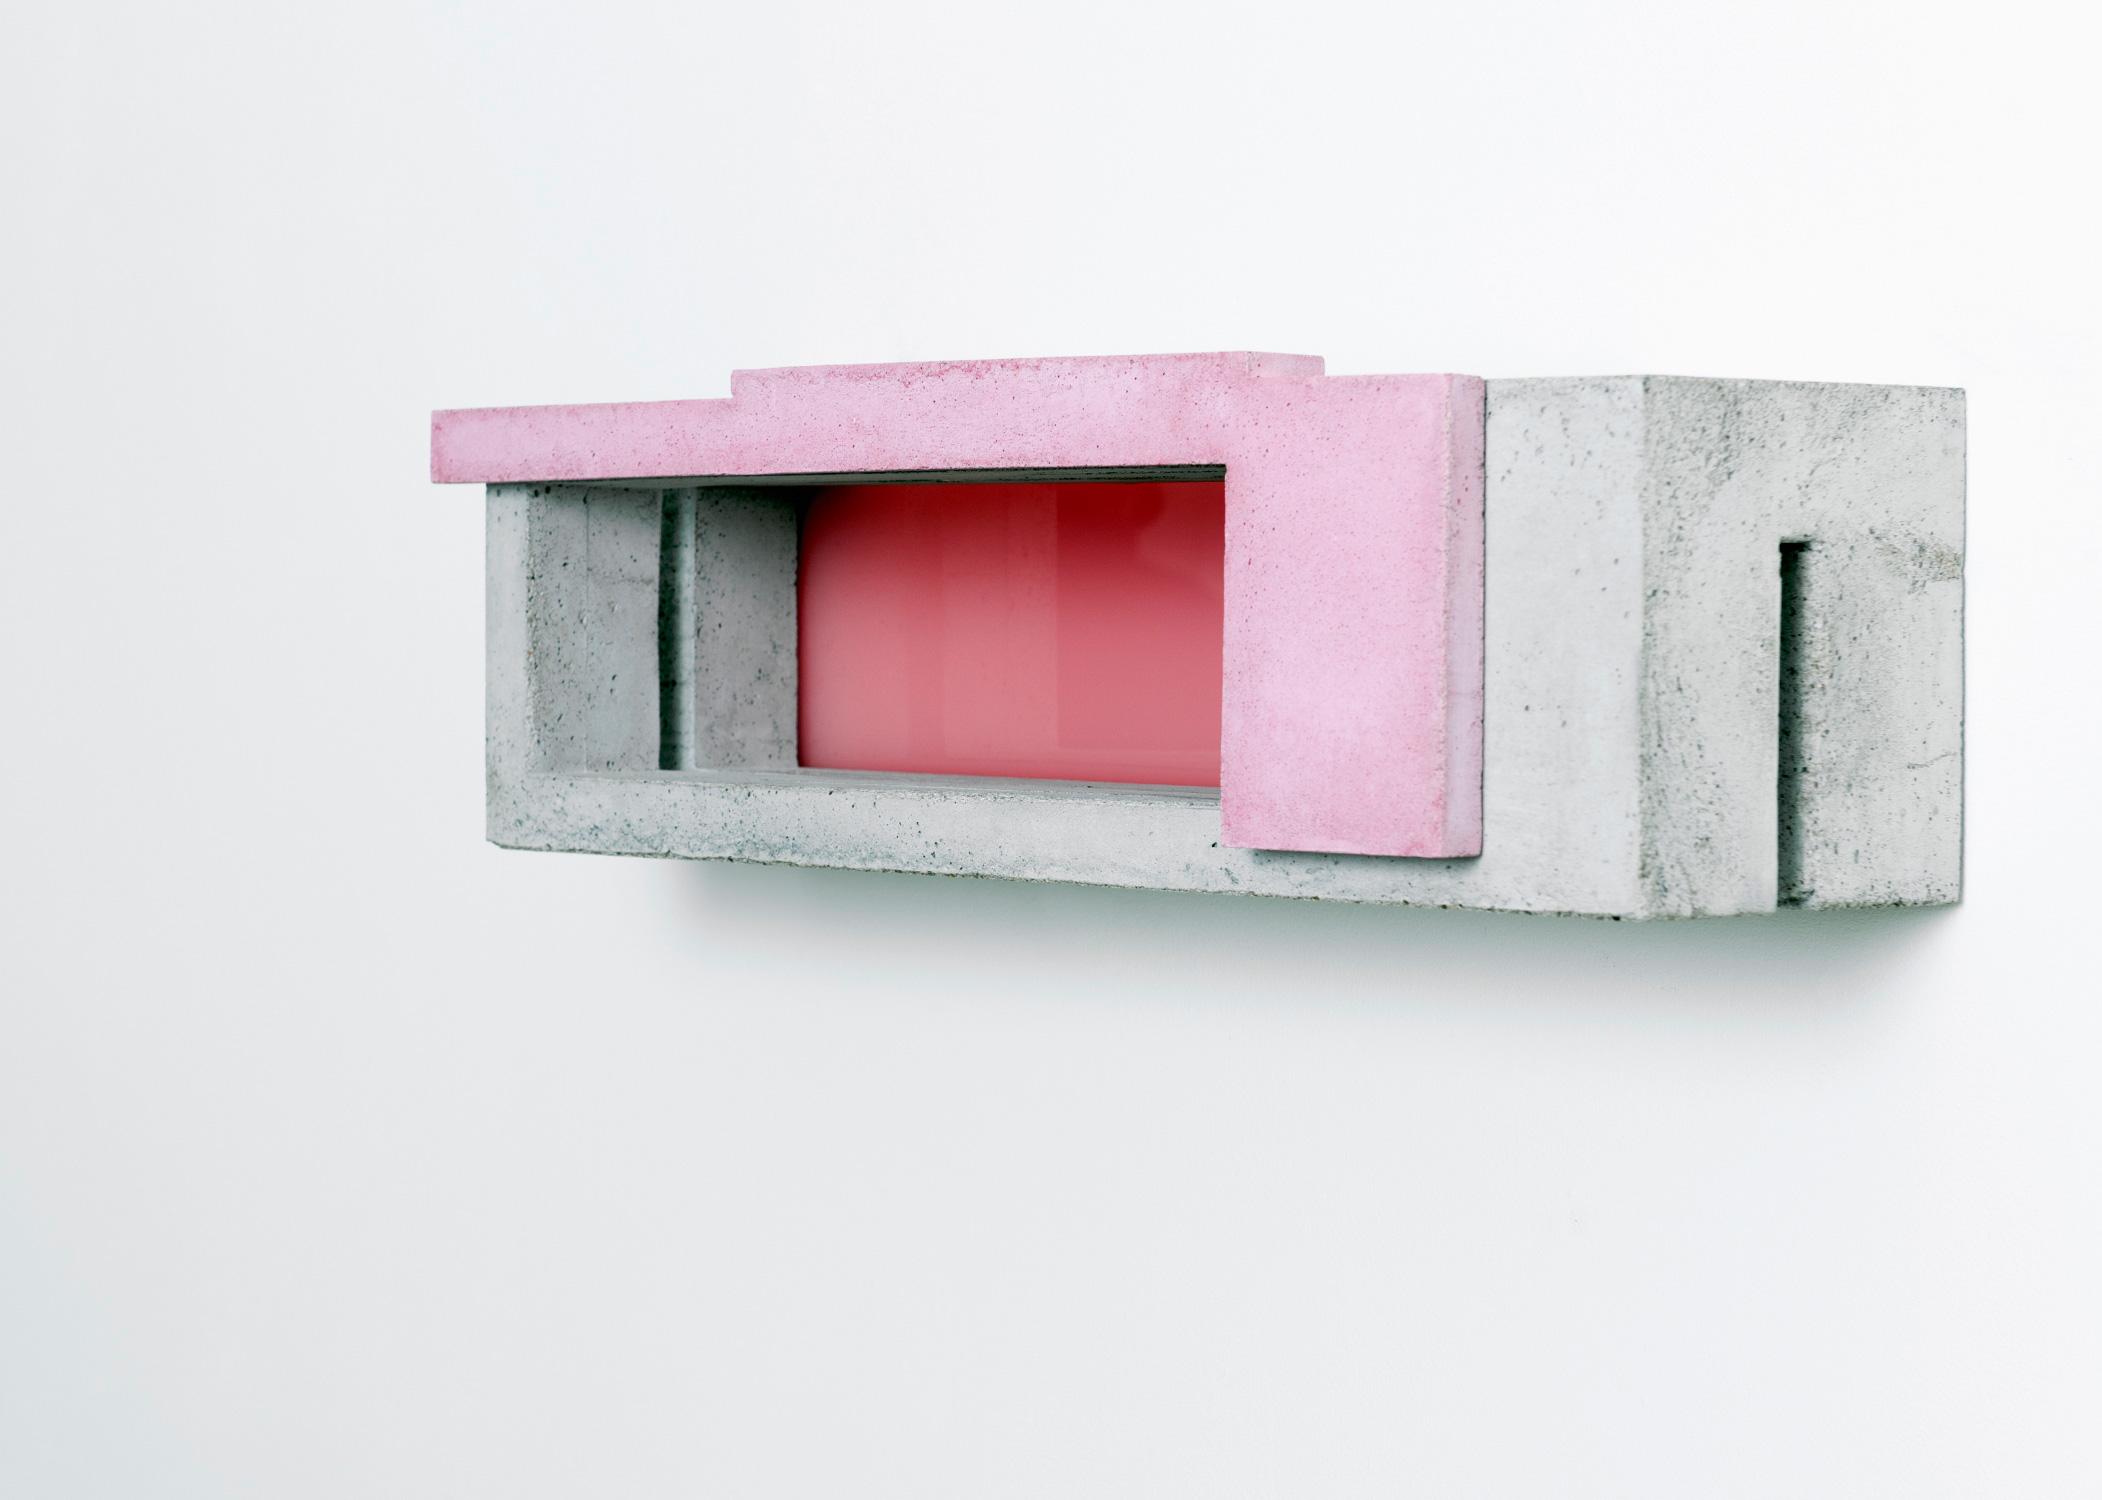 Box X/1 | 2016 | Beton,Acrylglas | 67 x 23 x 23 cm